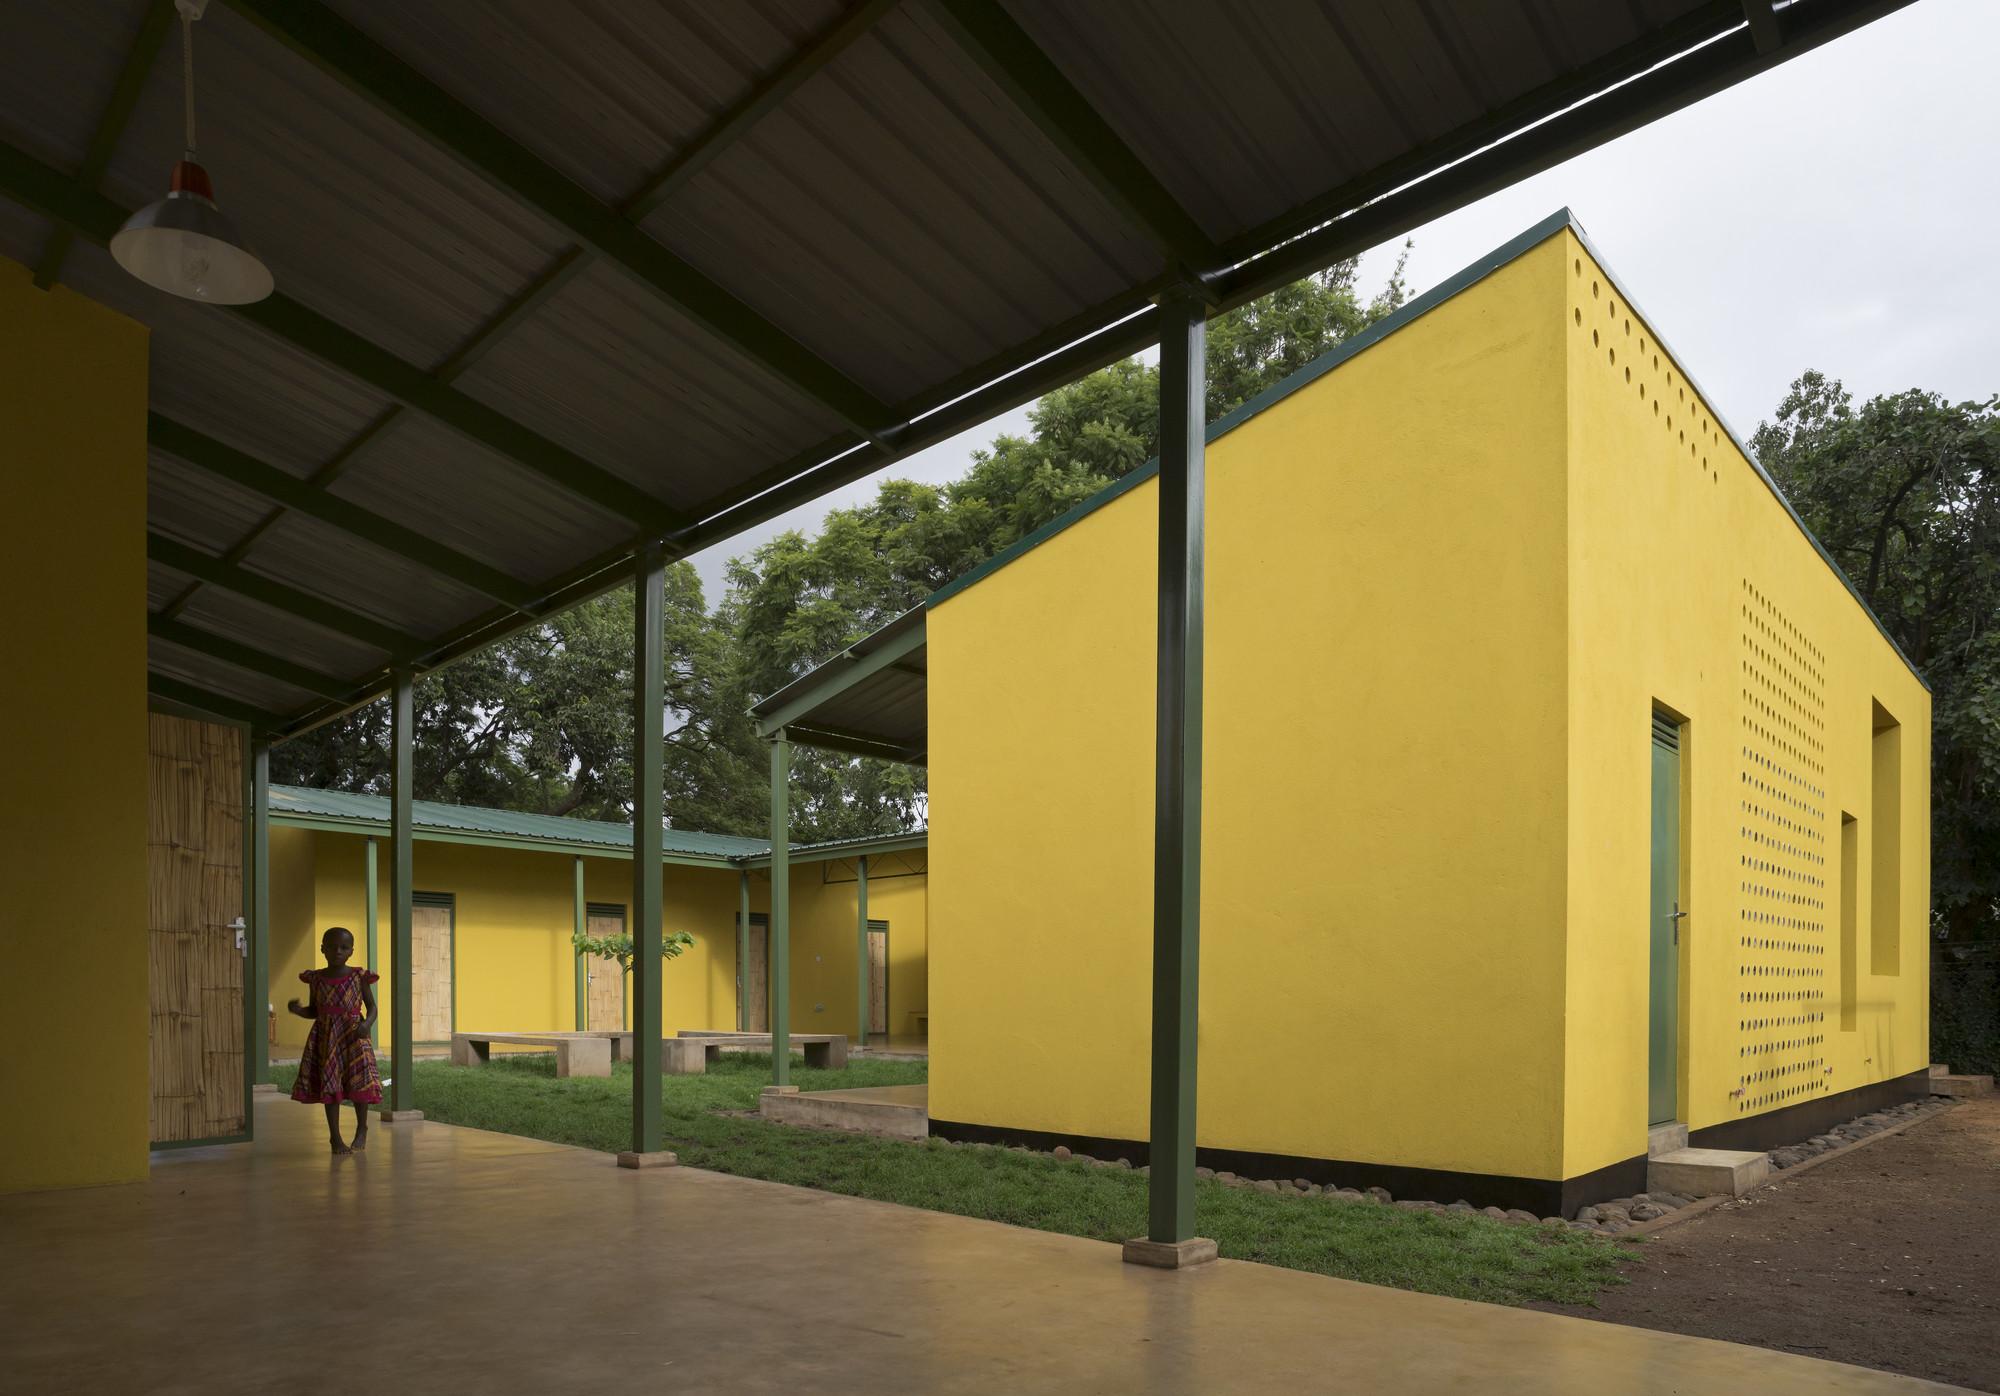 Casa Albergue KWIECO / Hollmén Reuter Sandman Architects, © Juha Ilonen